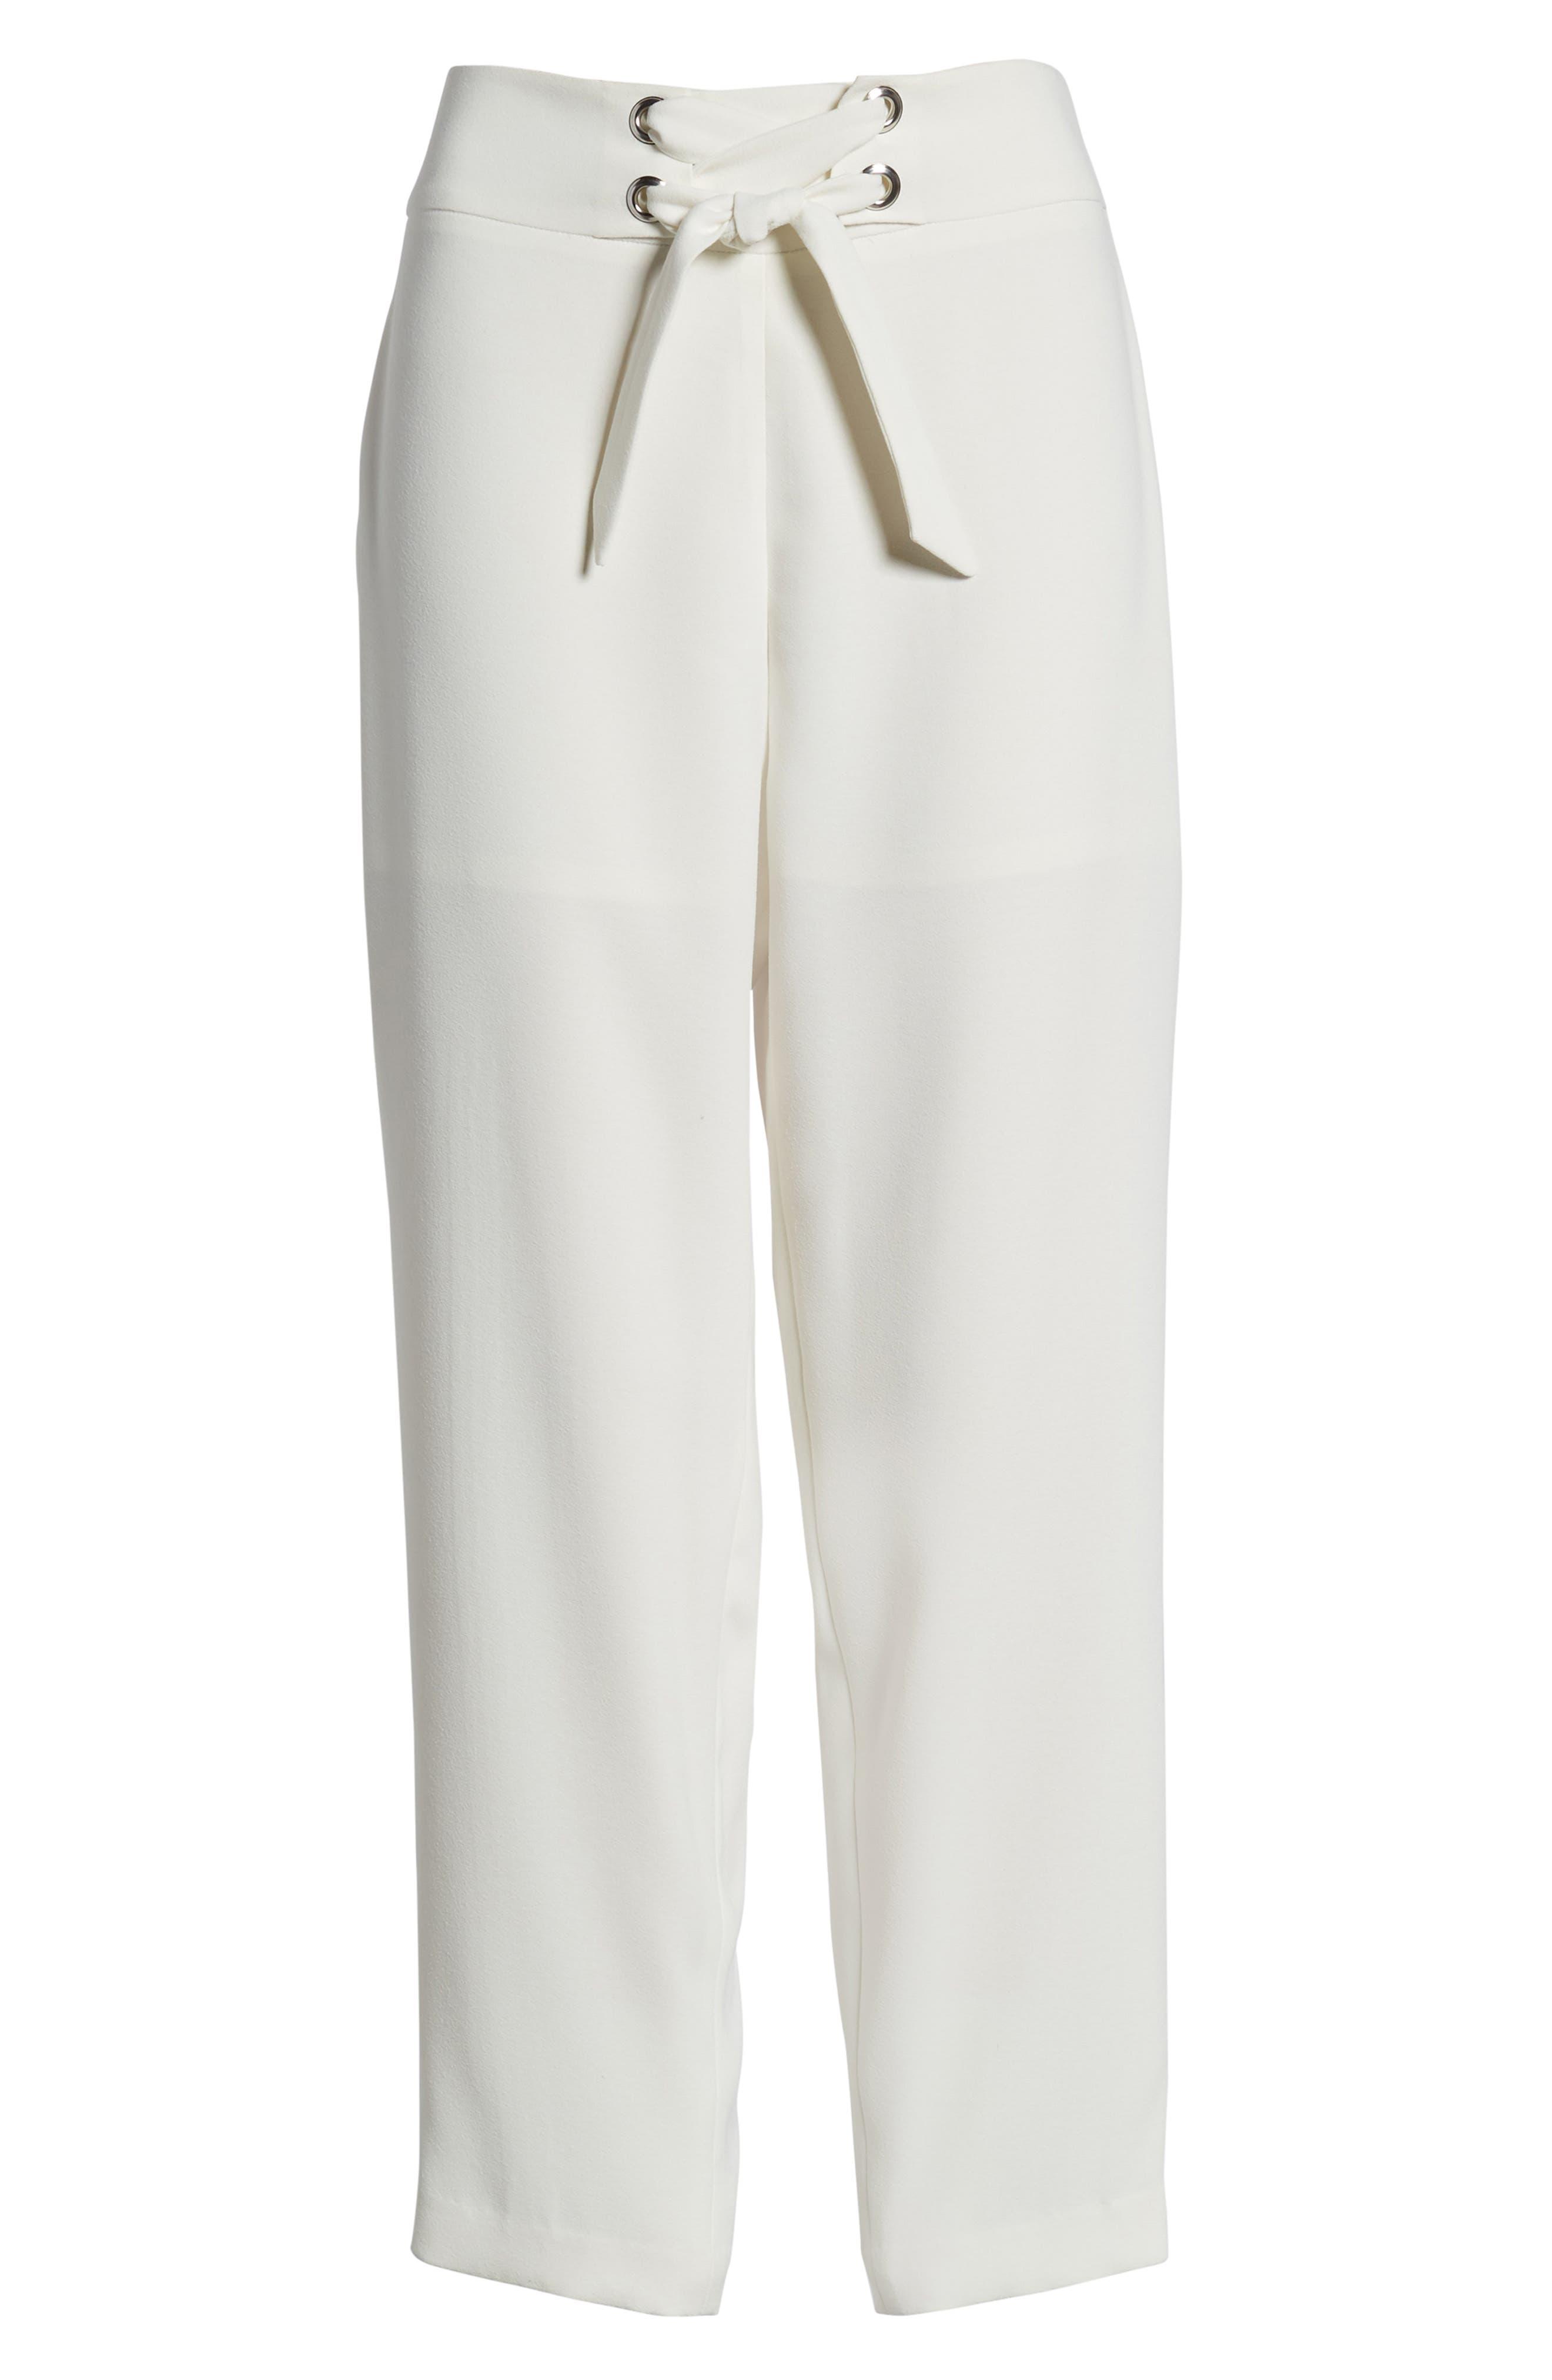 Tie Front Pants,                             Alternate thumbnail 7, color,                             Ivory